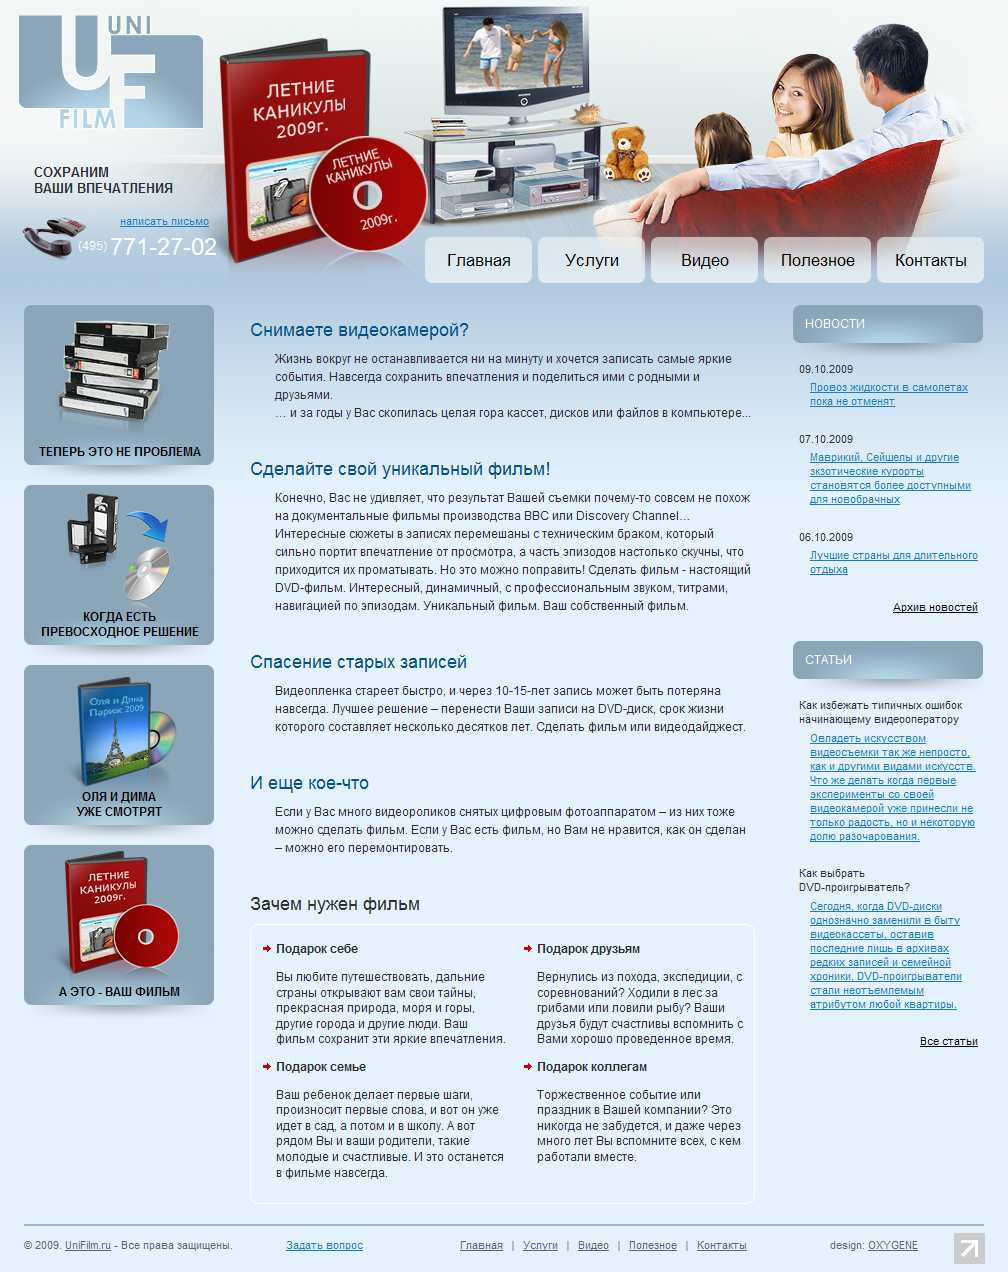 Сайт студии видеомонтажа Unifilm.Ru (Drupal)